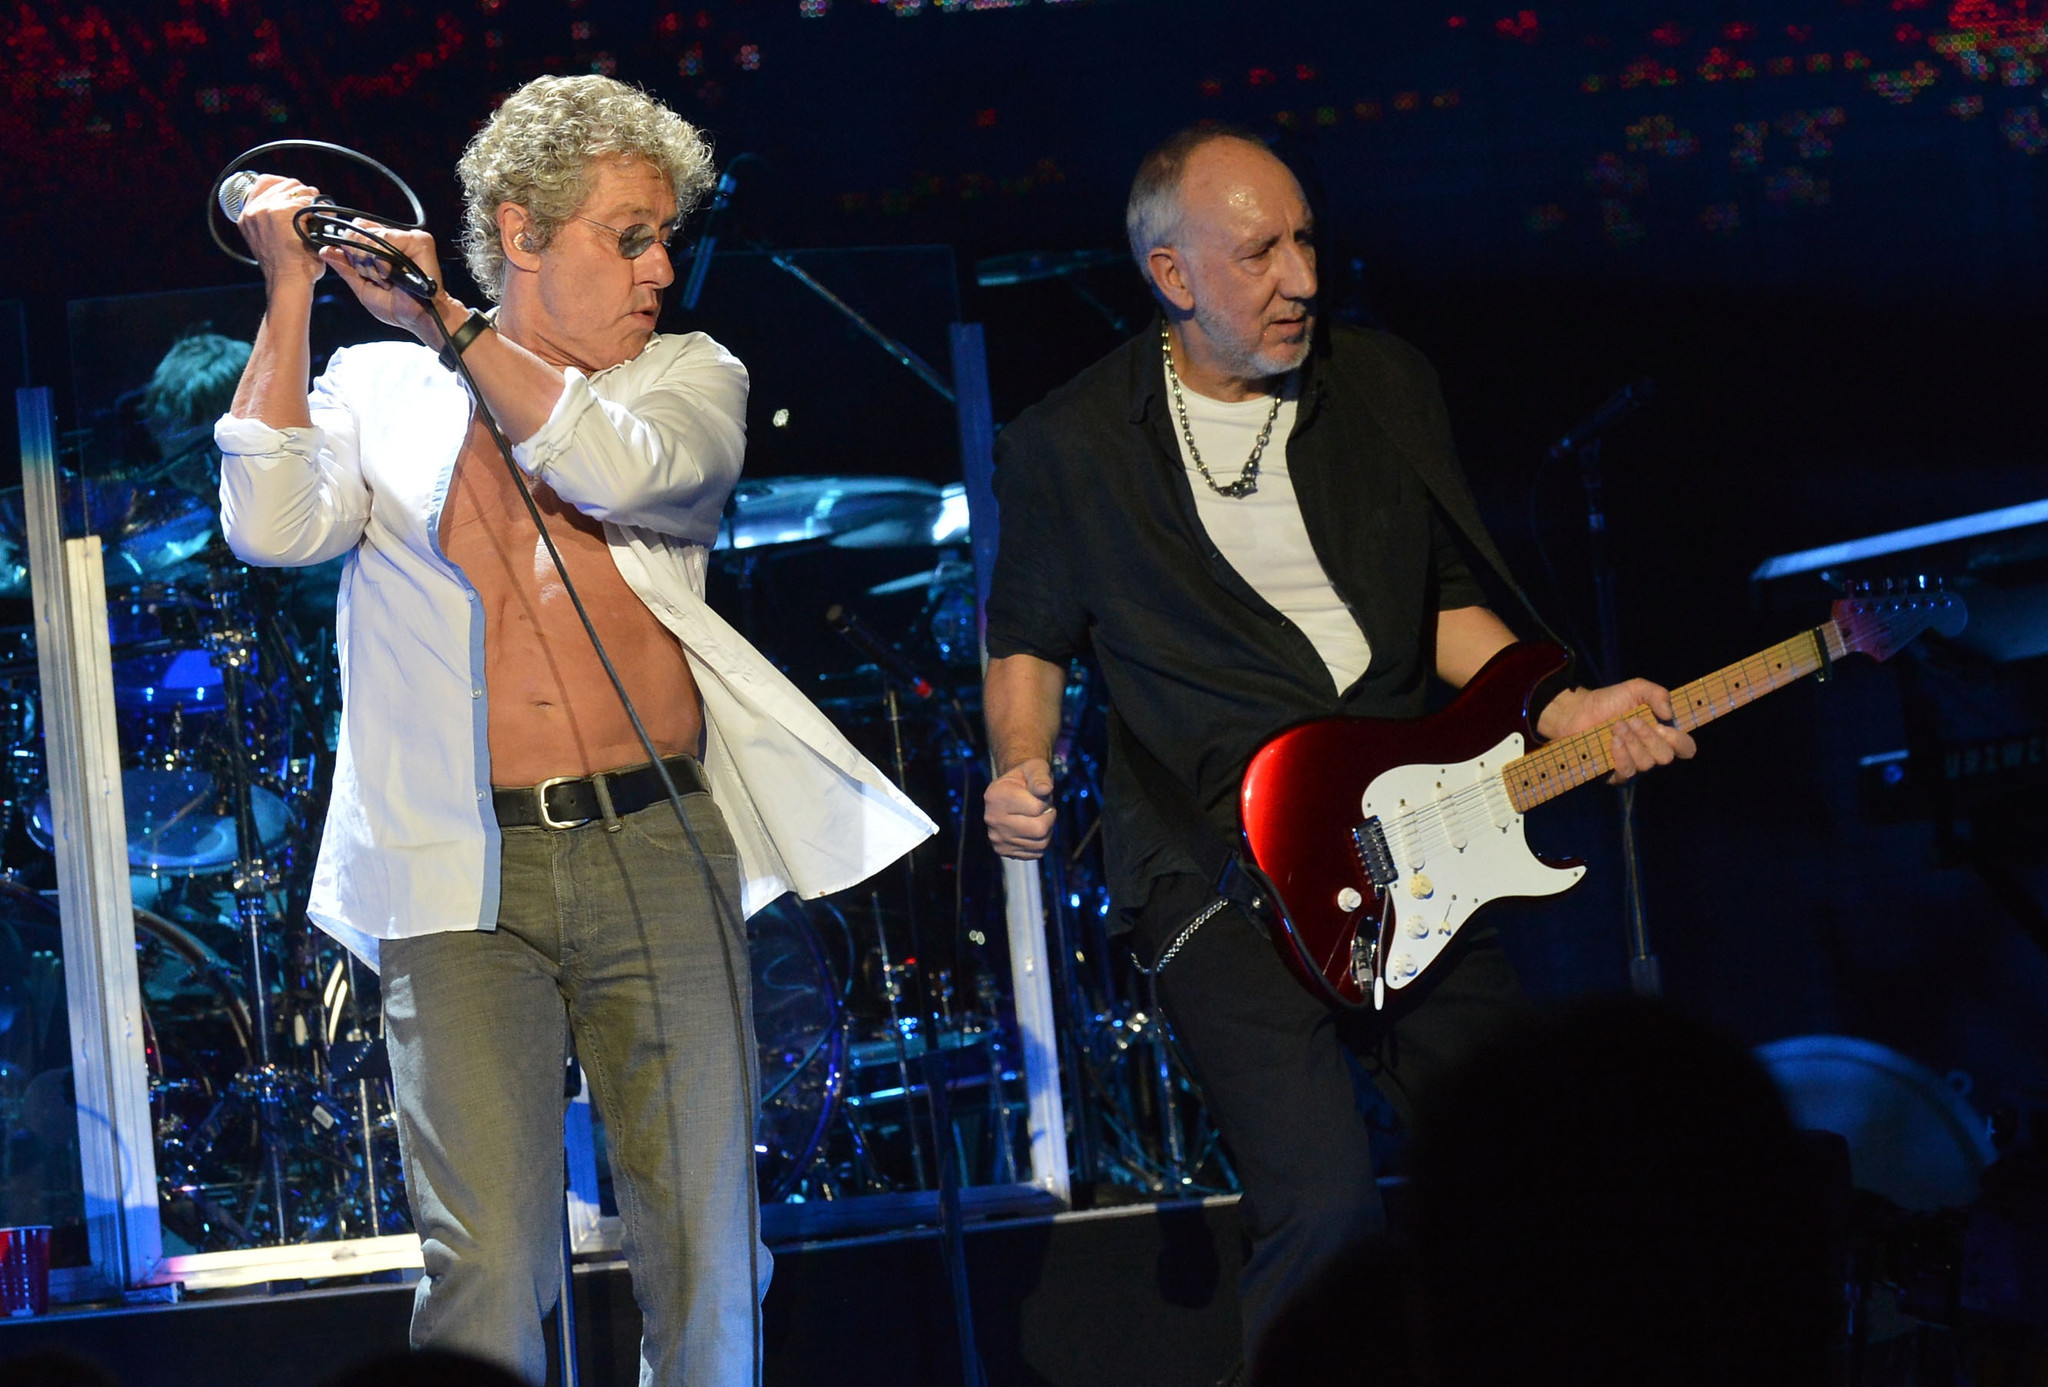 The Who, 50th anniversary tour, Q102, Jingle Ball